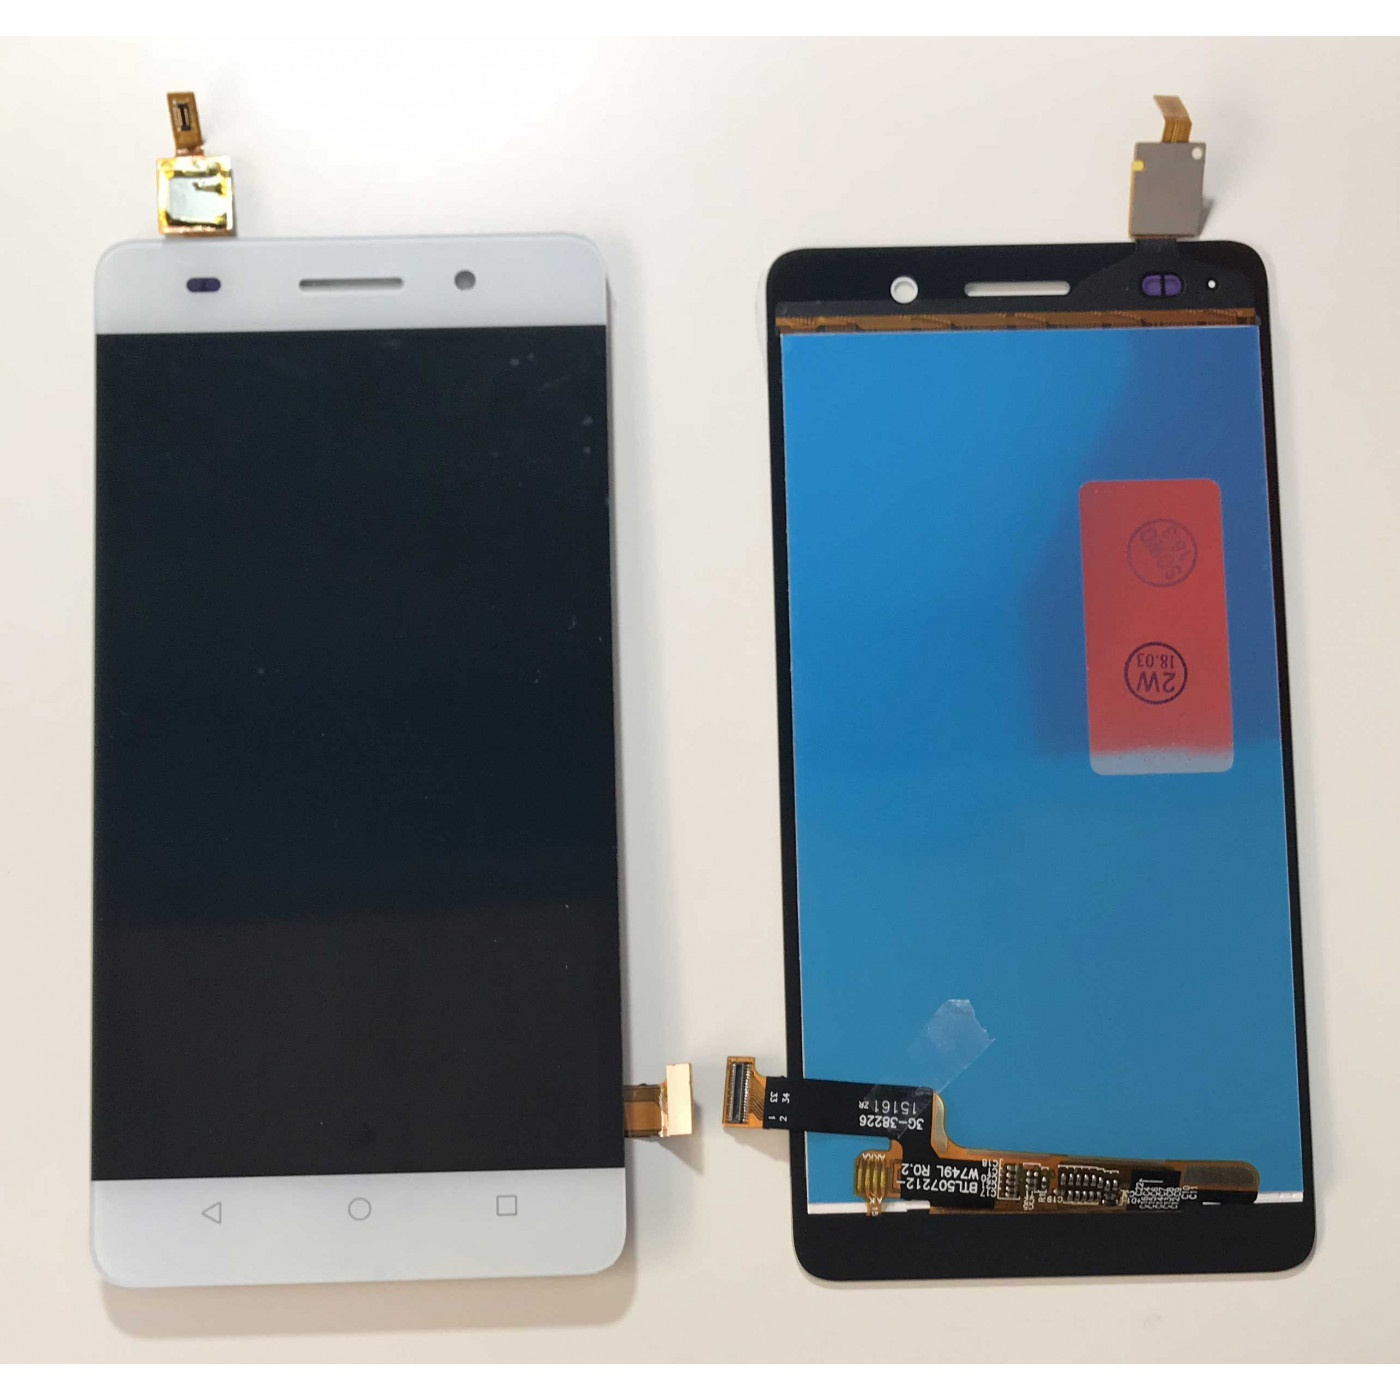 Huawei G Play mini CHC-U01 white